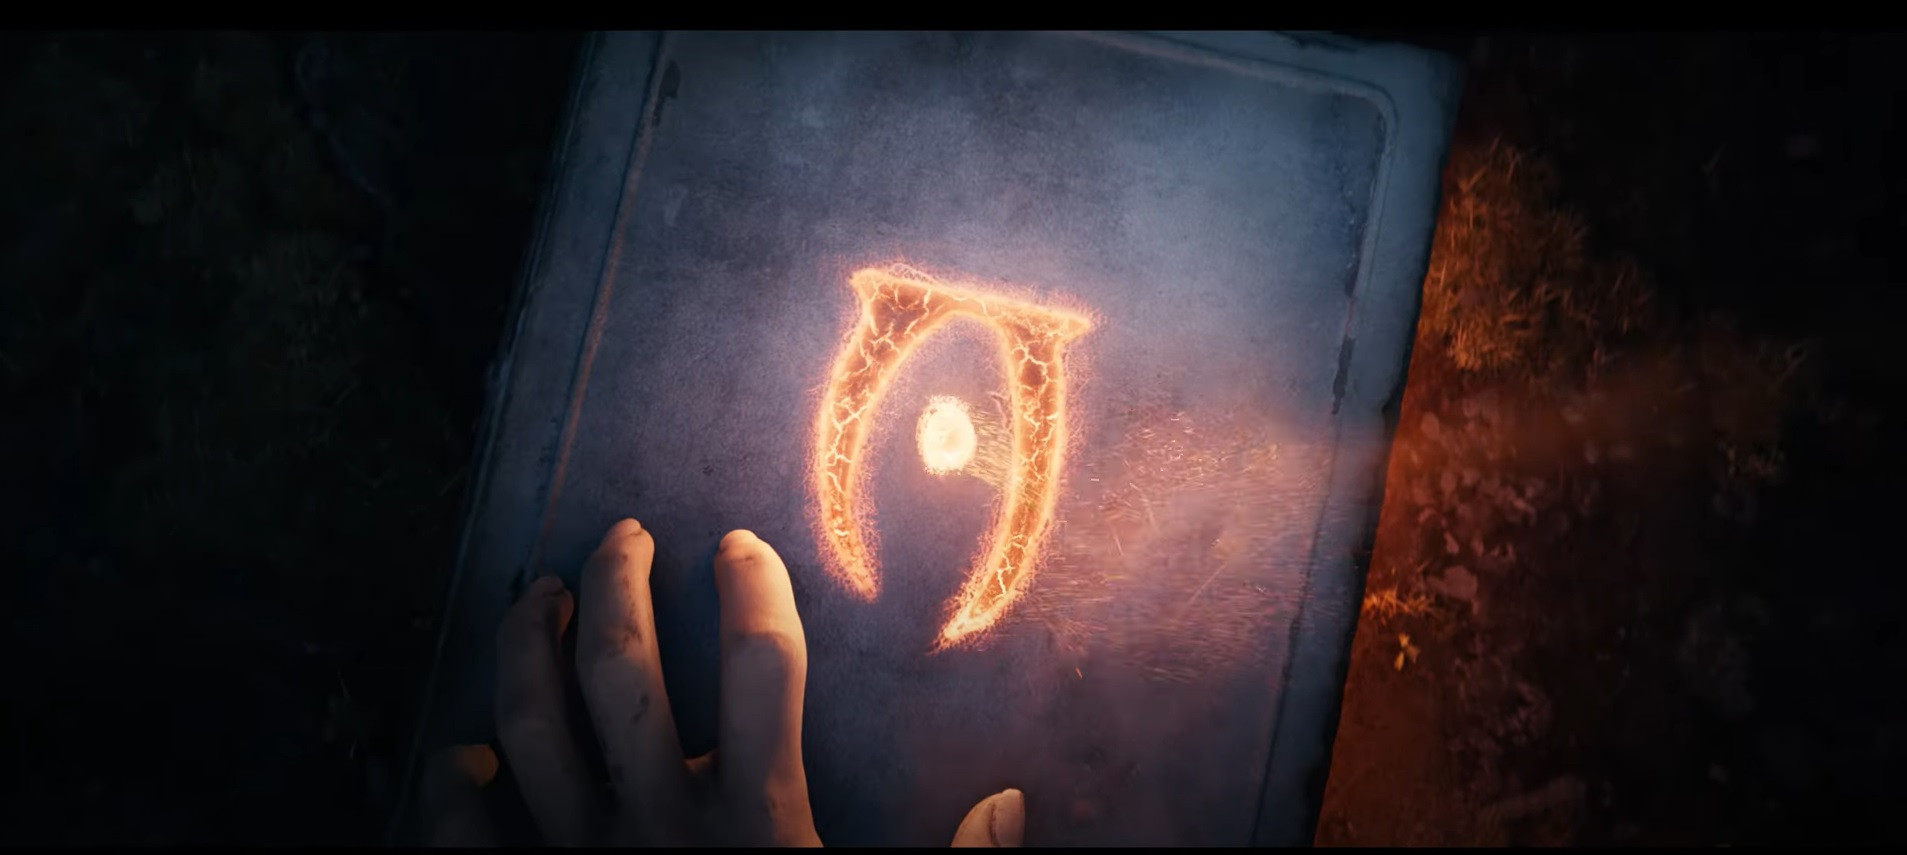 Games Inbox: Why is The Elder Scrolls 6 taking so long?